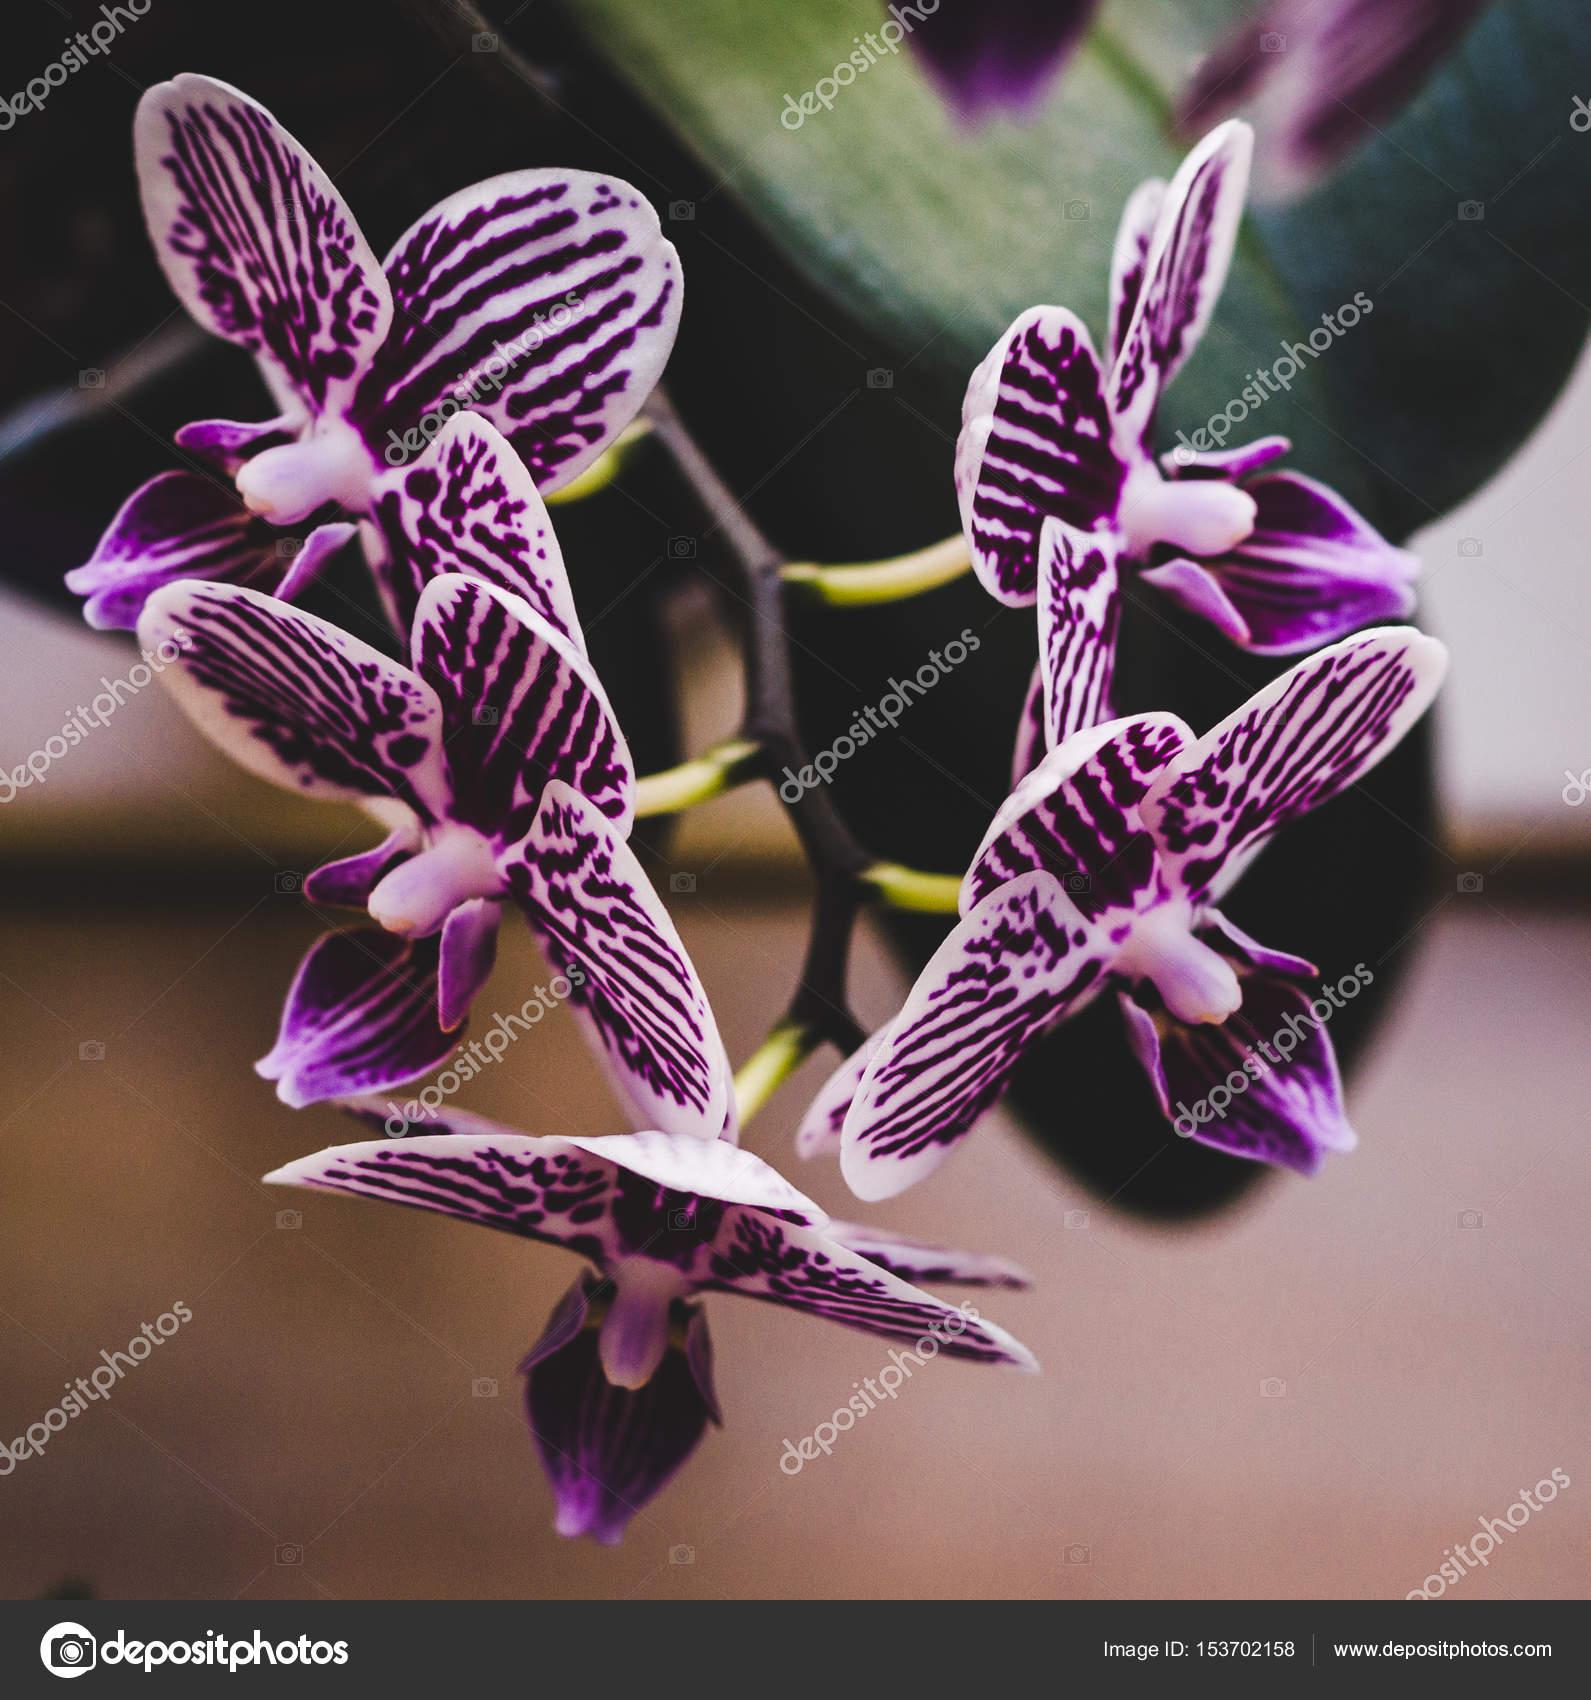 Flowering House Plants, Indoor Plants U2014 Stock Photo